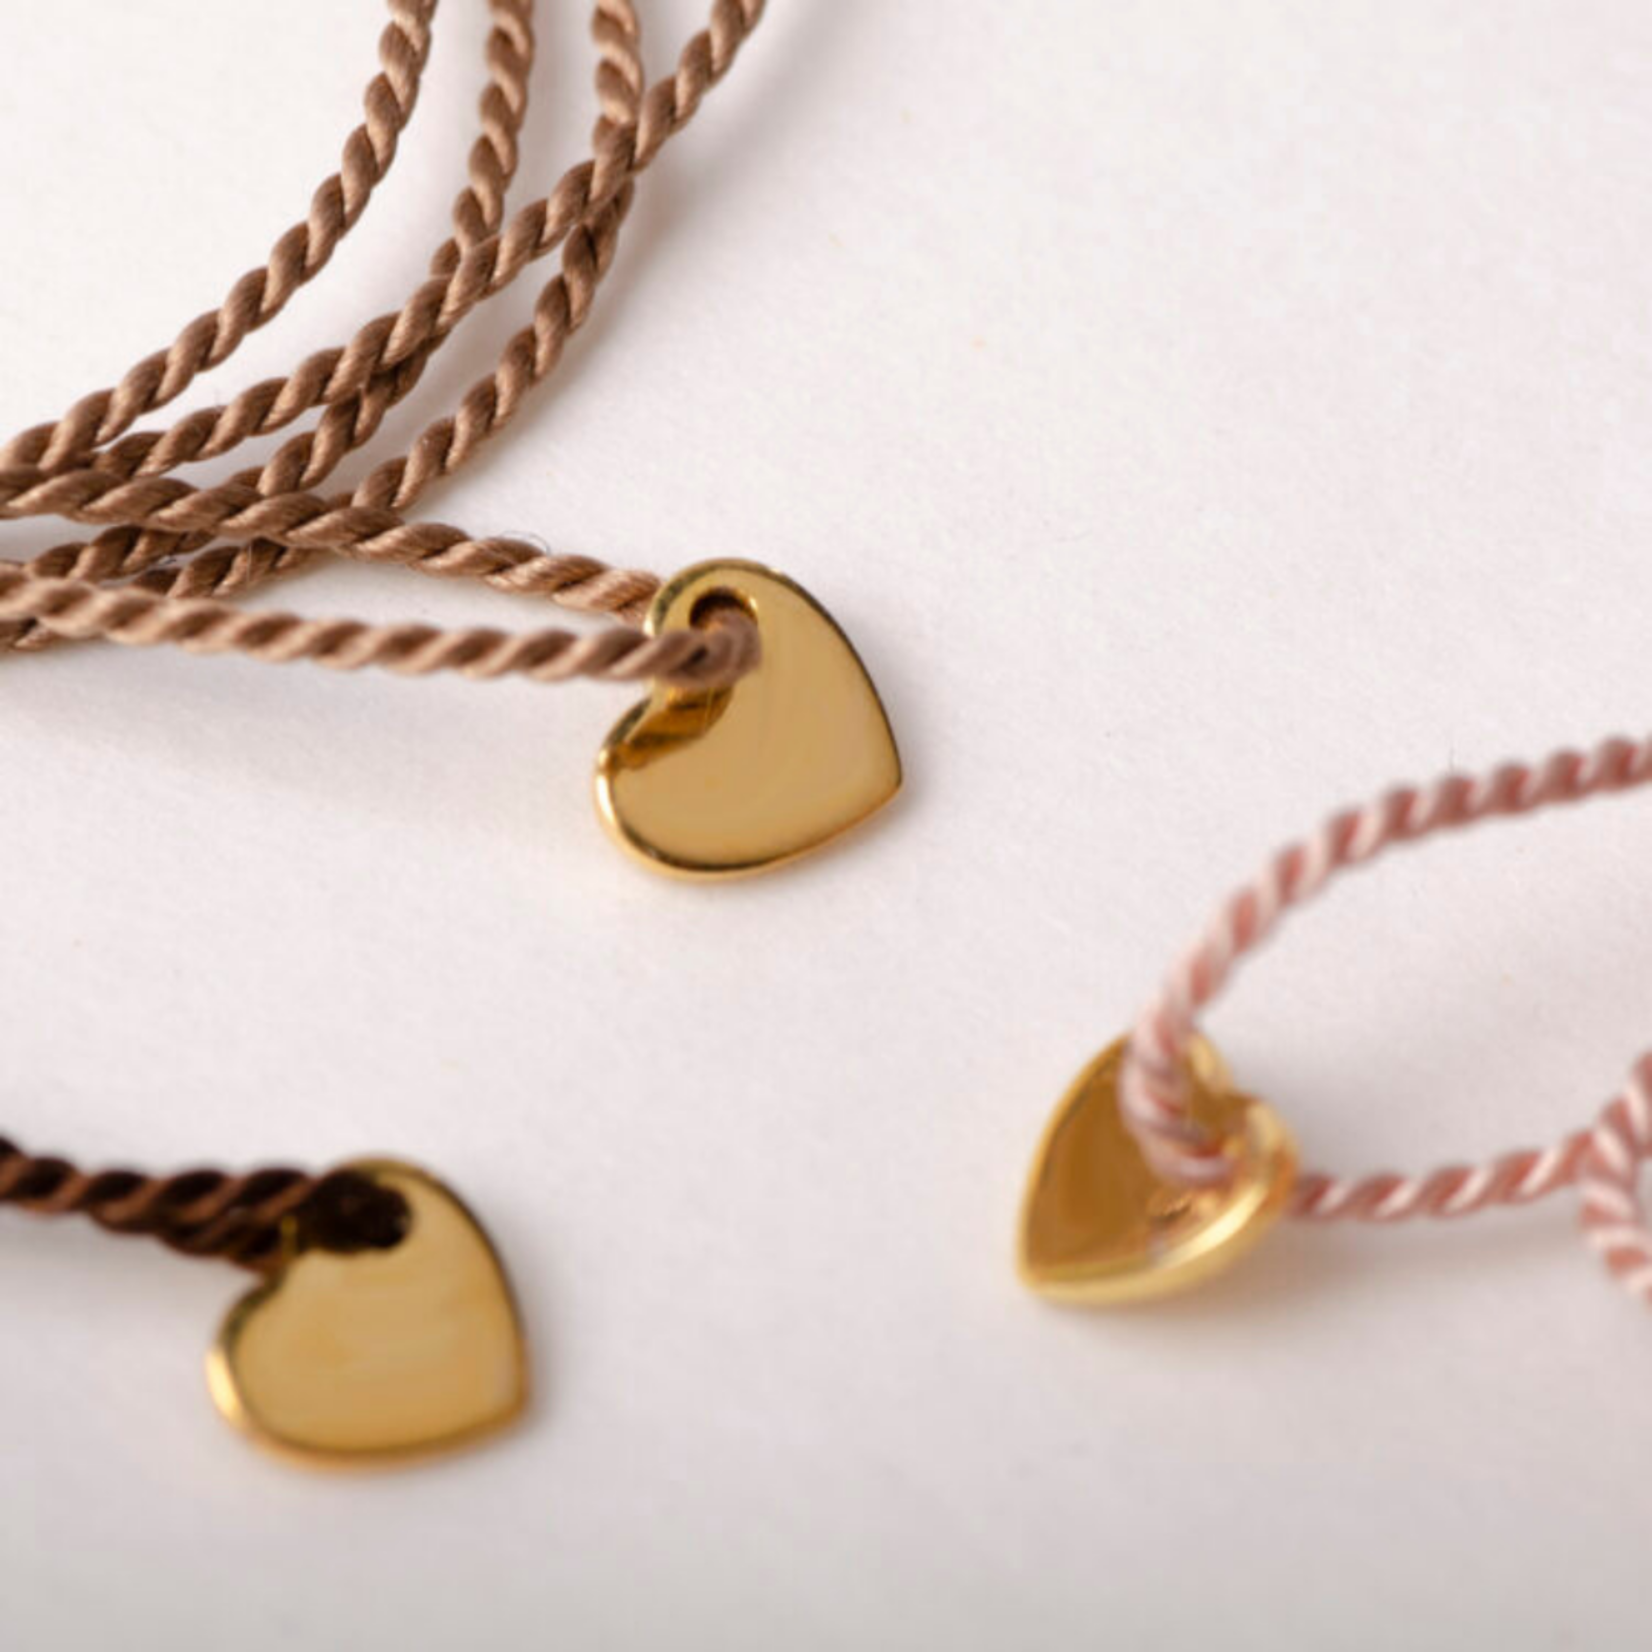 charlotte wooning charlotte wooning - bracelet love knot